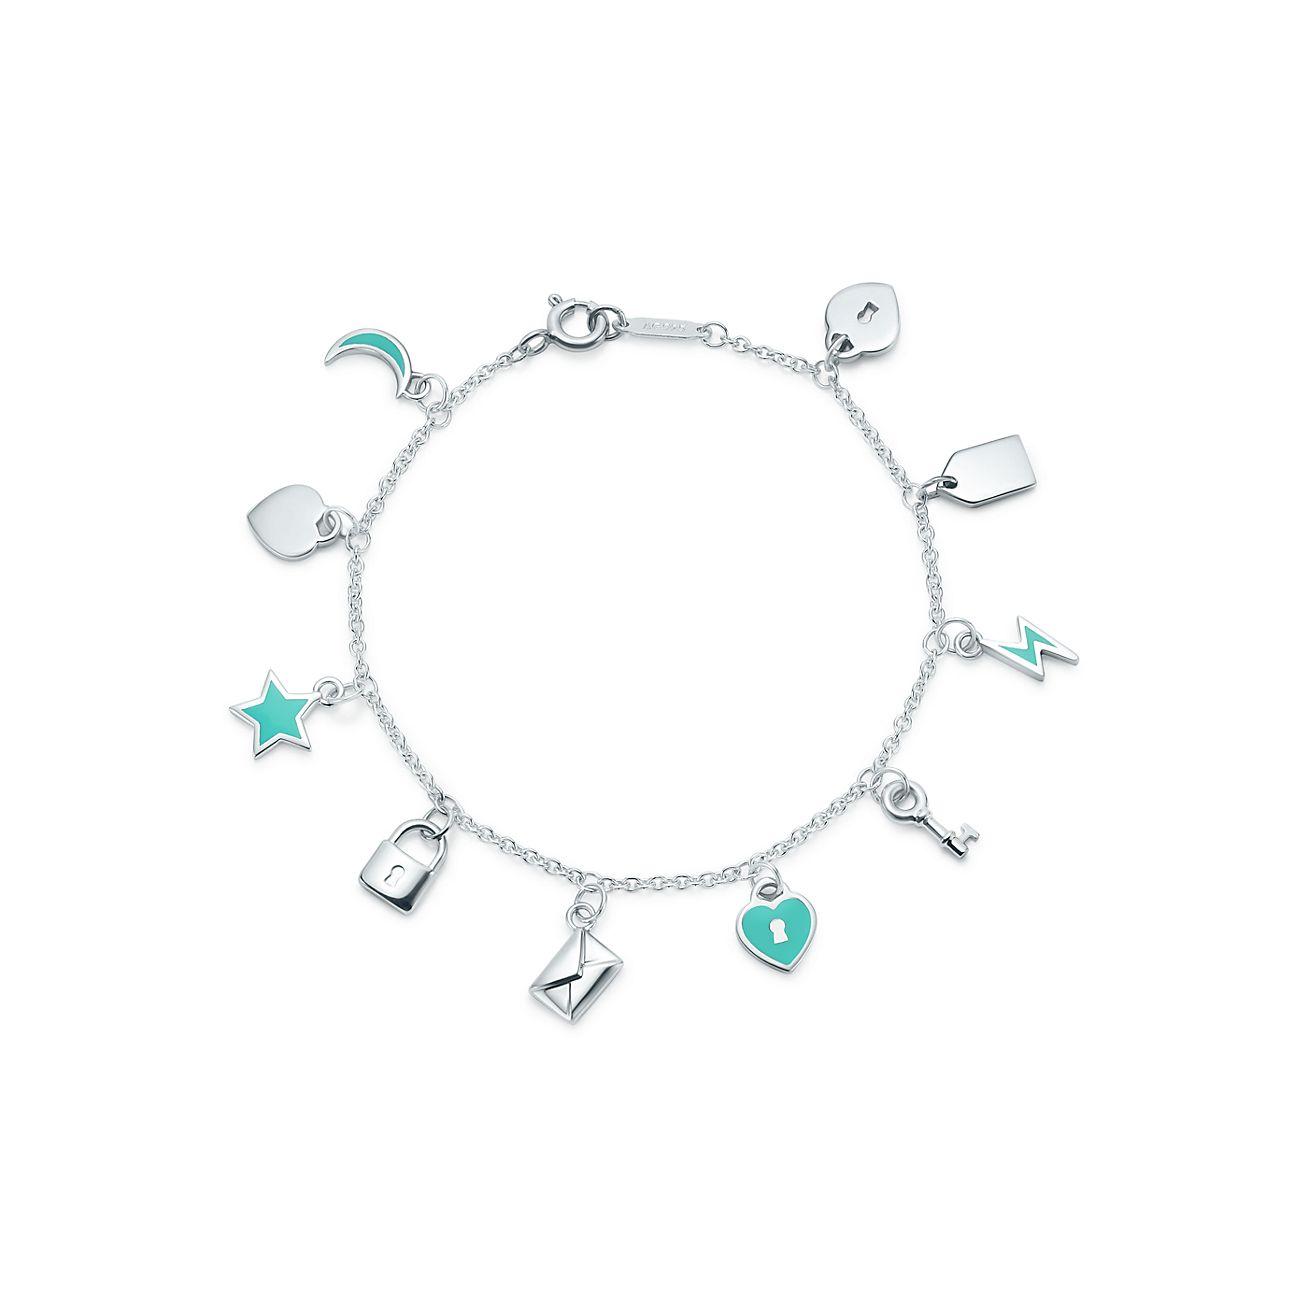 Tiffany Heart Bracelet >> Tiffanys Charm Bracelet ~ Best Bracelets